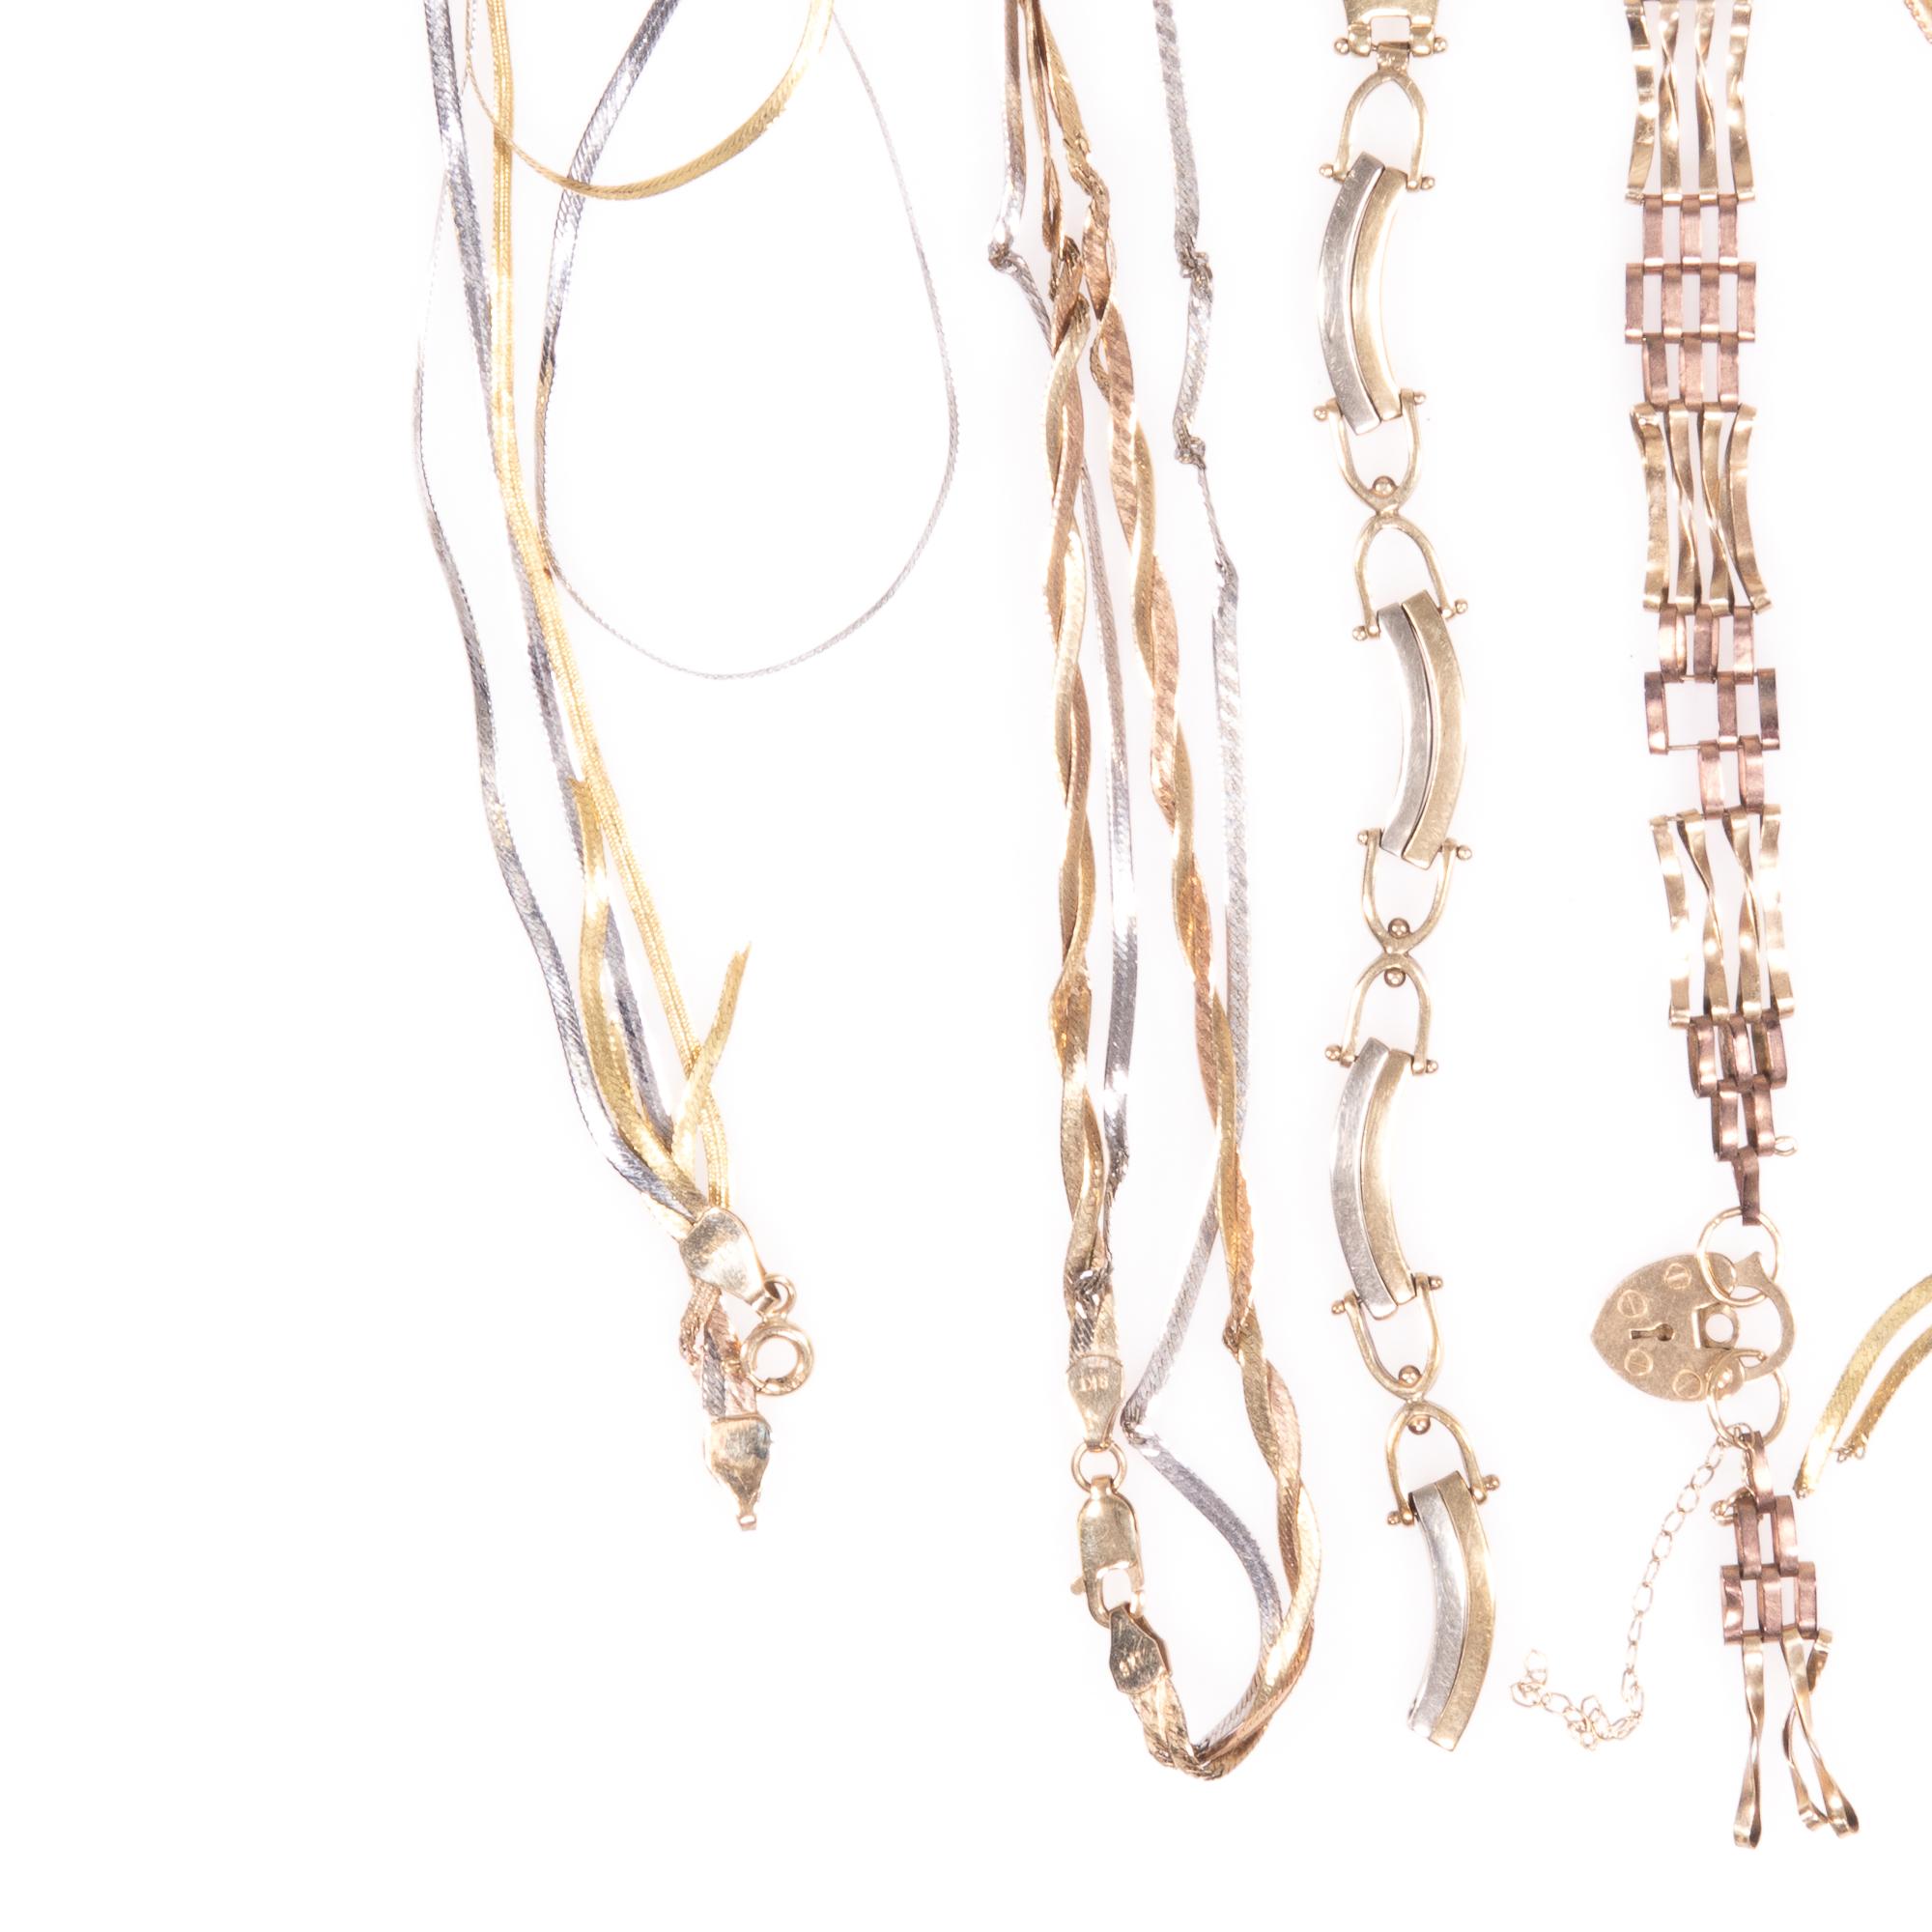 26 grams Scrap Gold Jewellery - Image 5 of 6